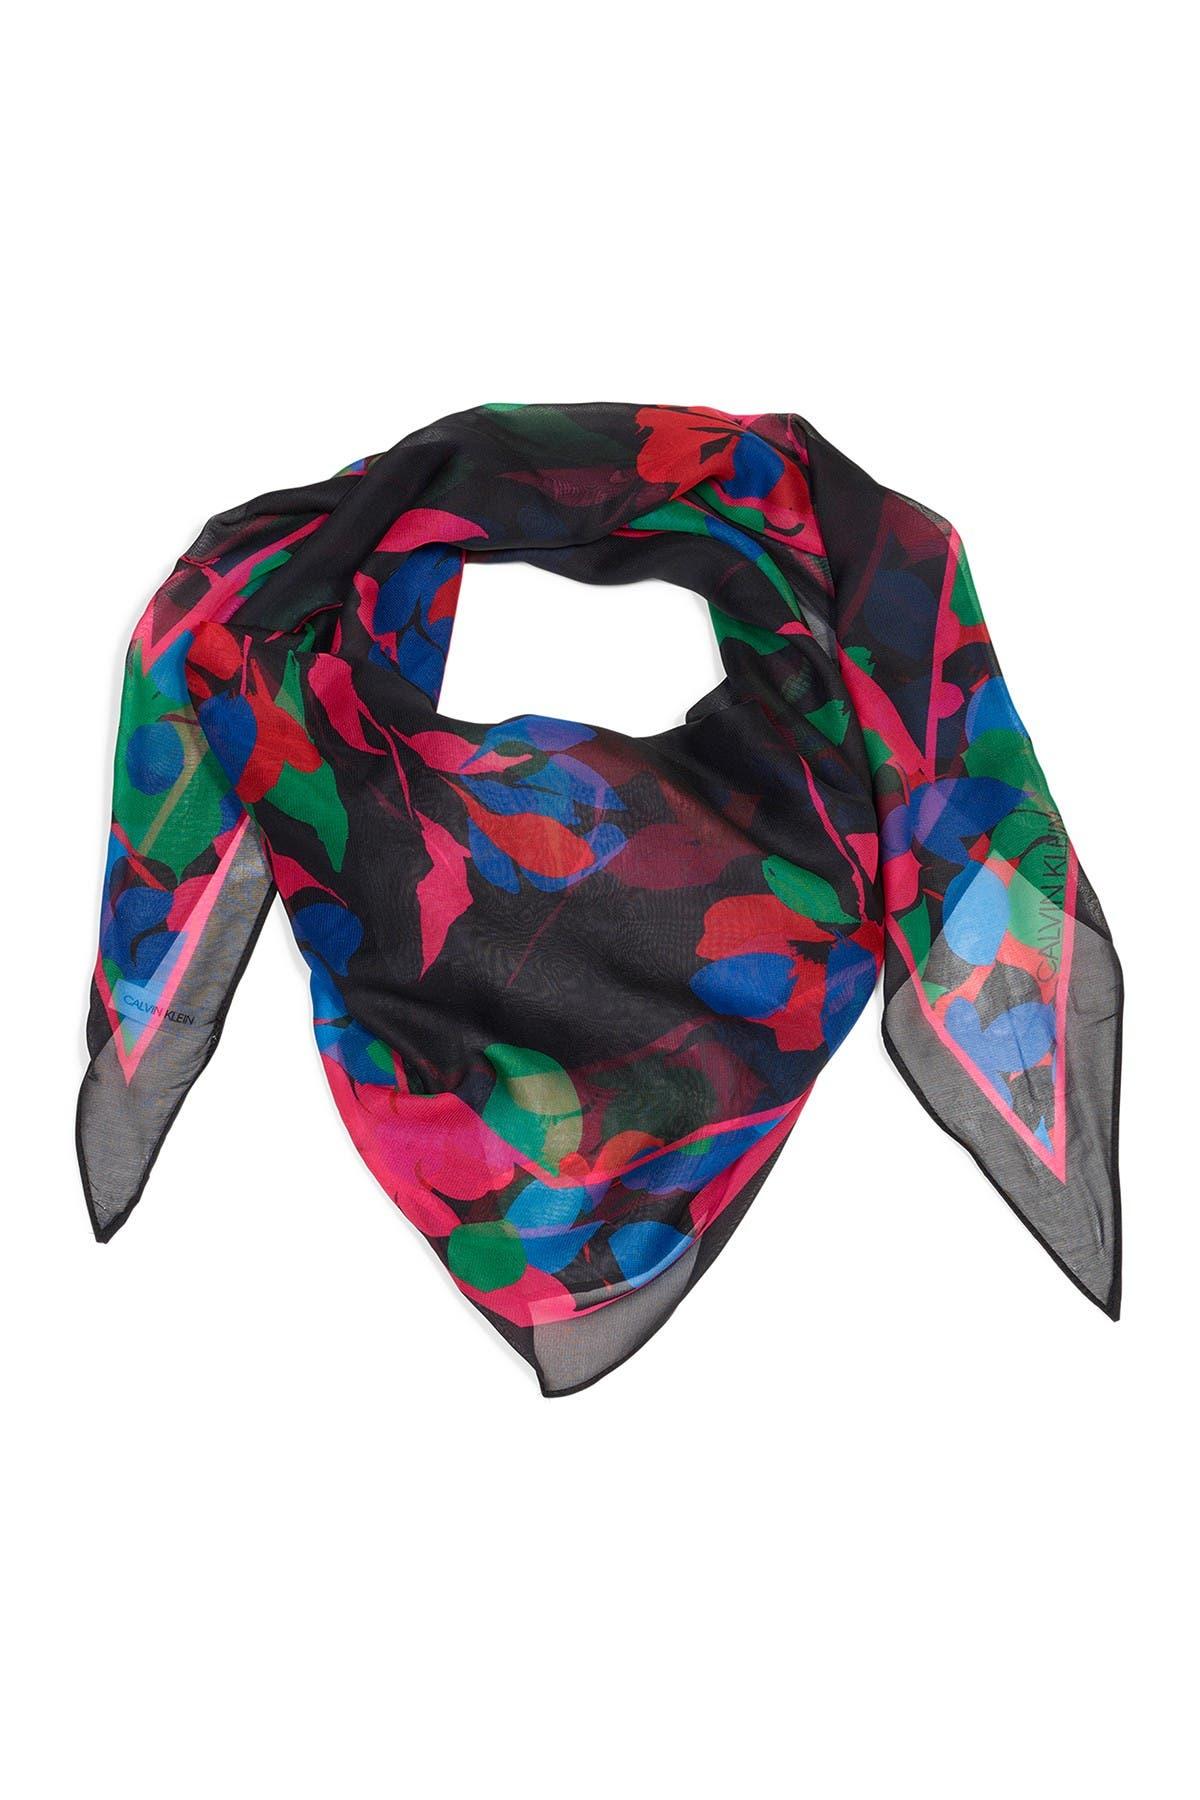 Chiffon Ladies Abstract Flower Design Scarf Shawl Wrap